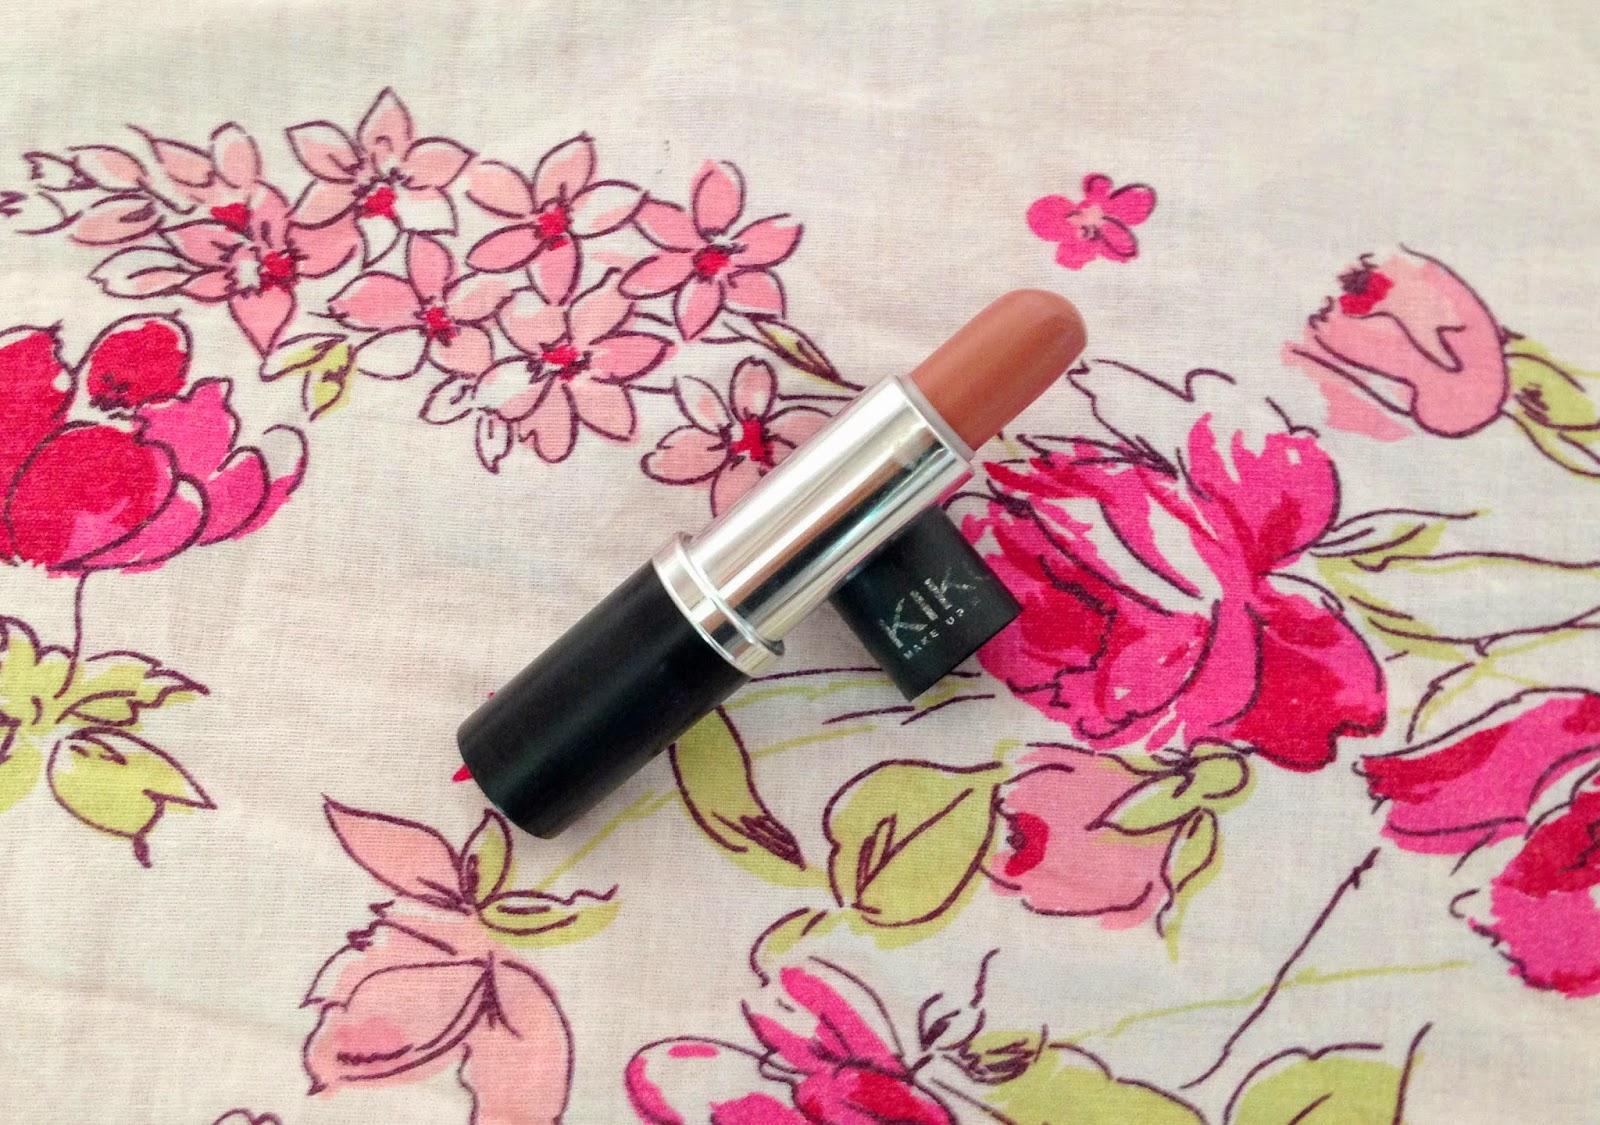 Letmecrossover_project_pan_ten_10_beauty_blog_products_mac_vc_avon_revlon_lip_butter_kiko_milano_lipstick_pink_nude